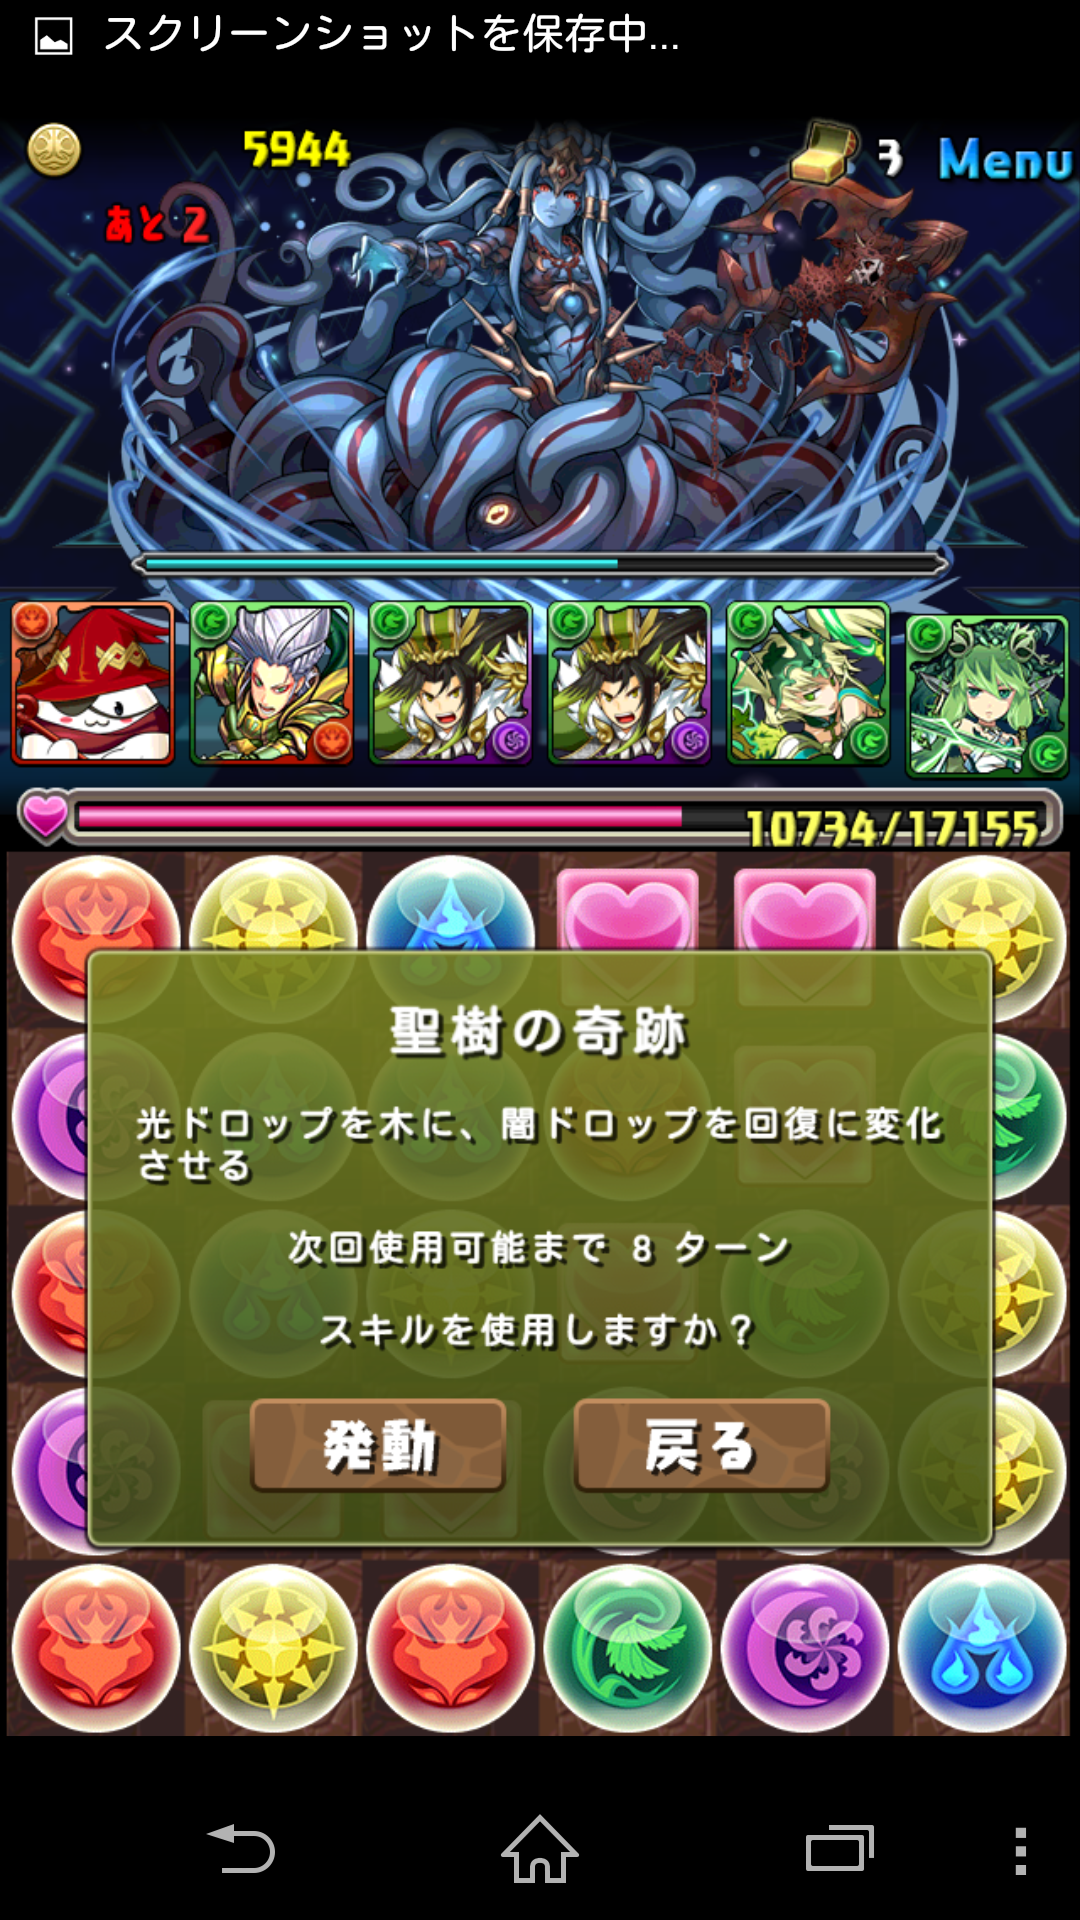 Screenshot_2015-02-20-22-10-41.png